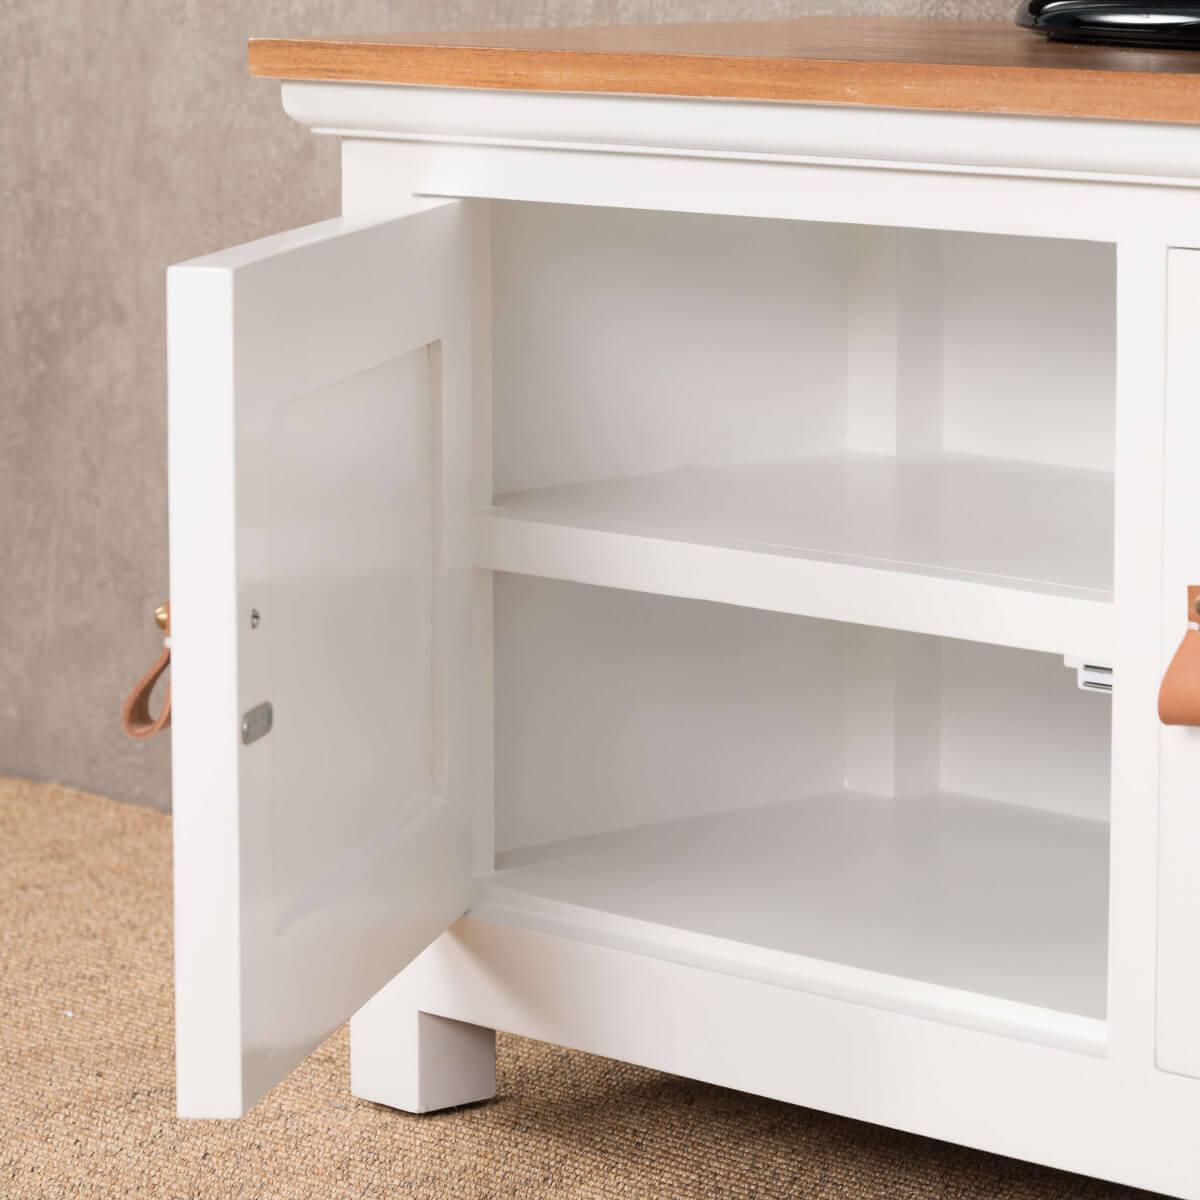 Meuble tv acajou meuble tv blanc et bois rectangle chic for Meuble japonais acajou